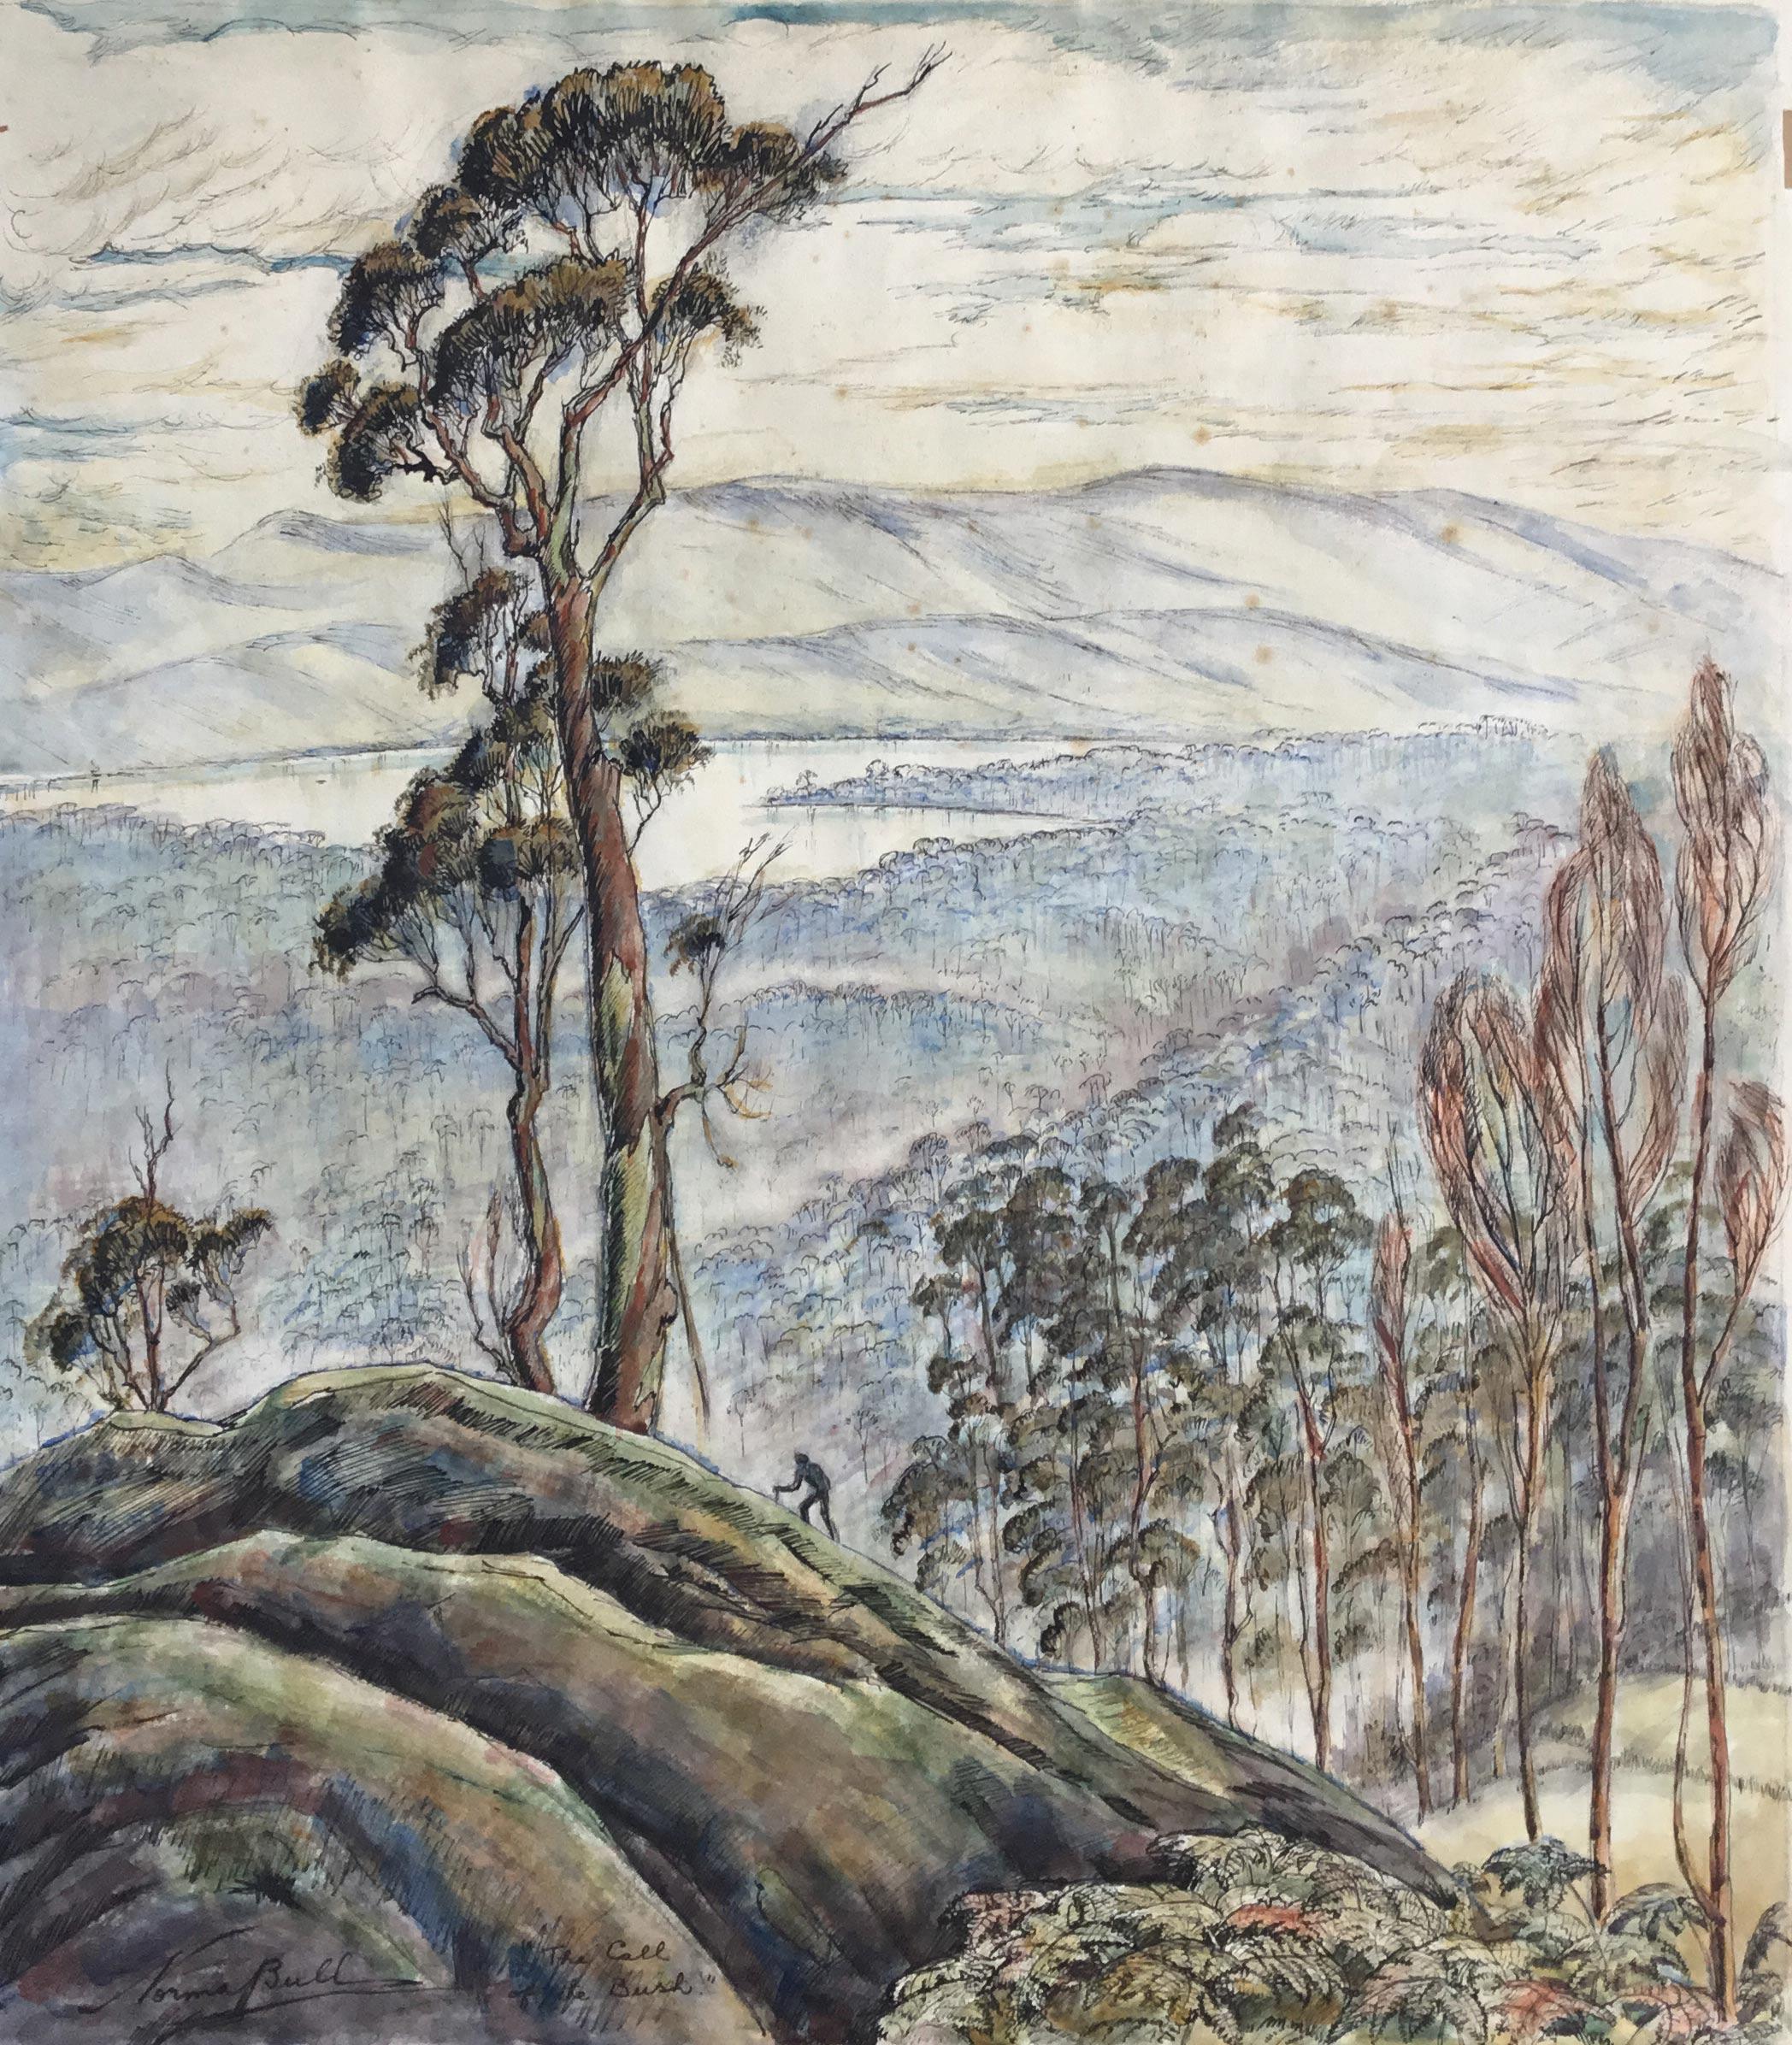 NORMA BULL (1906 - 1980)